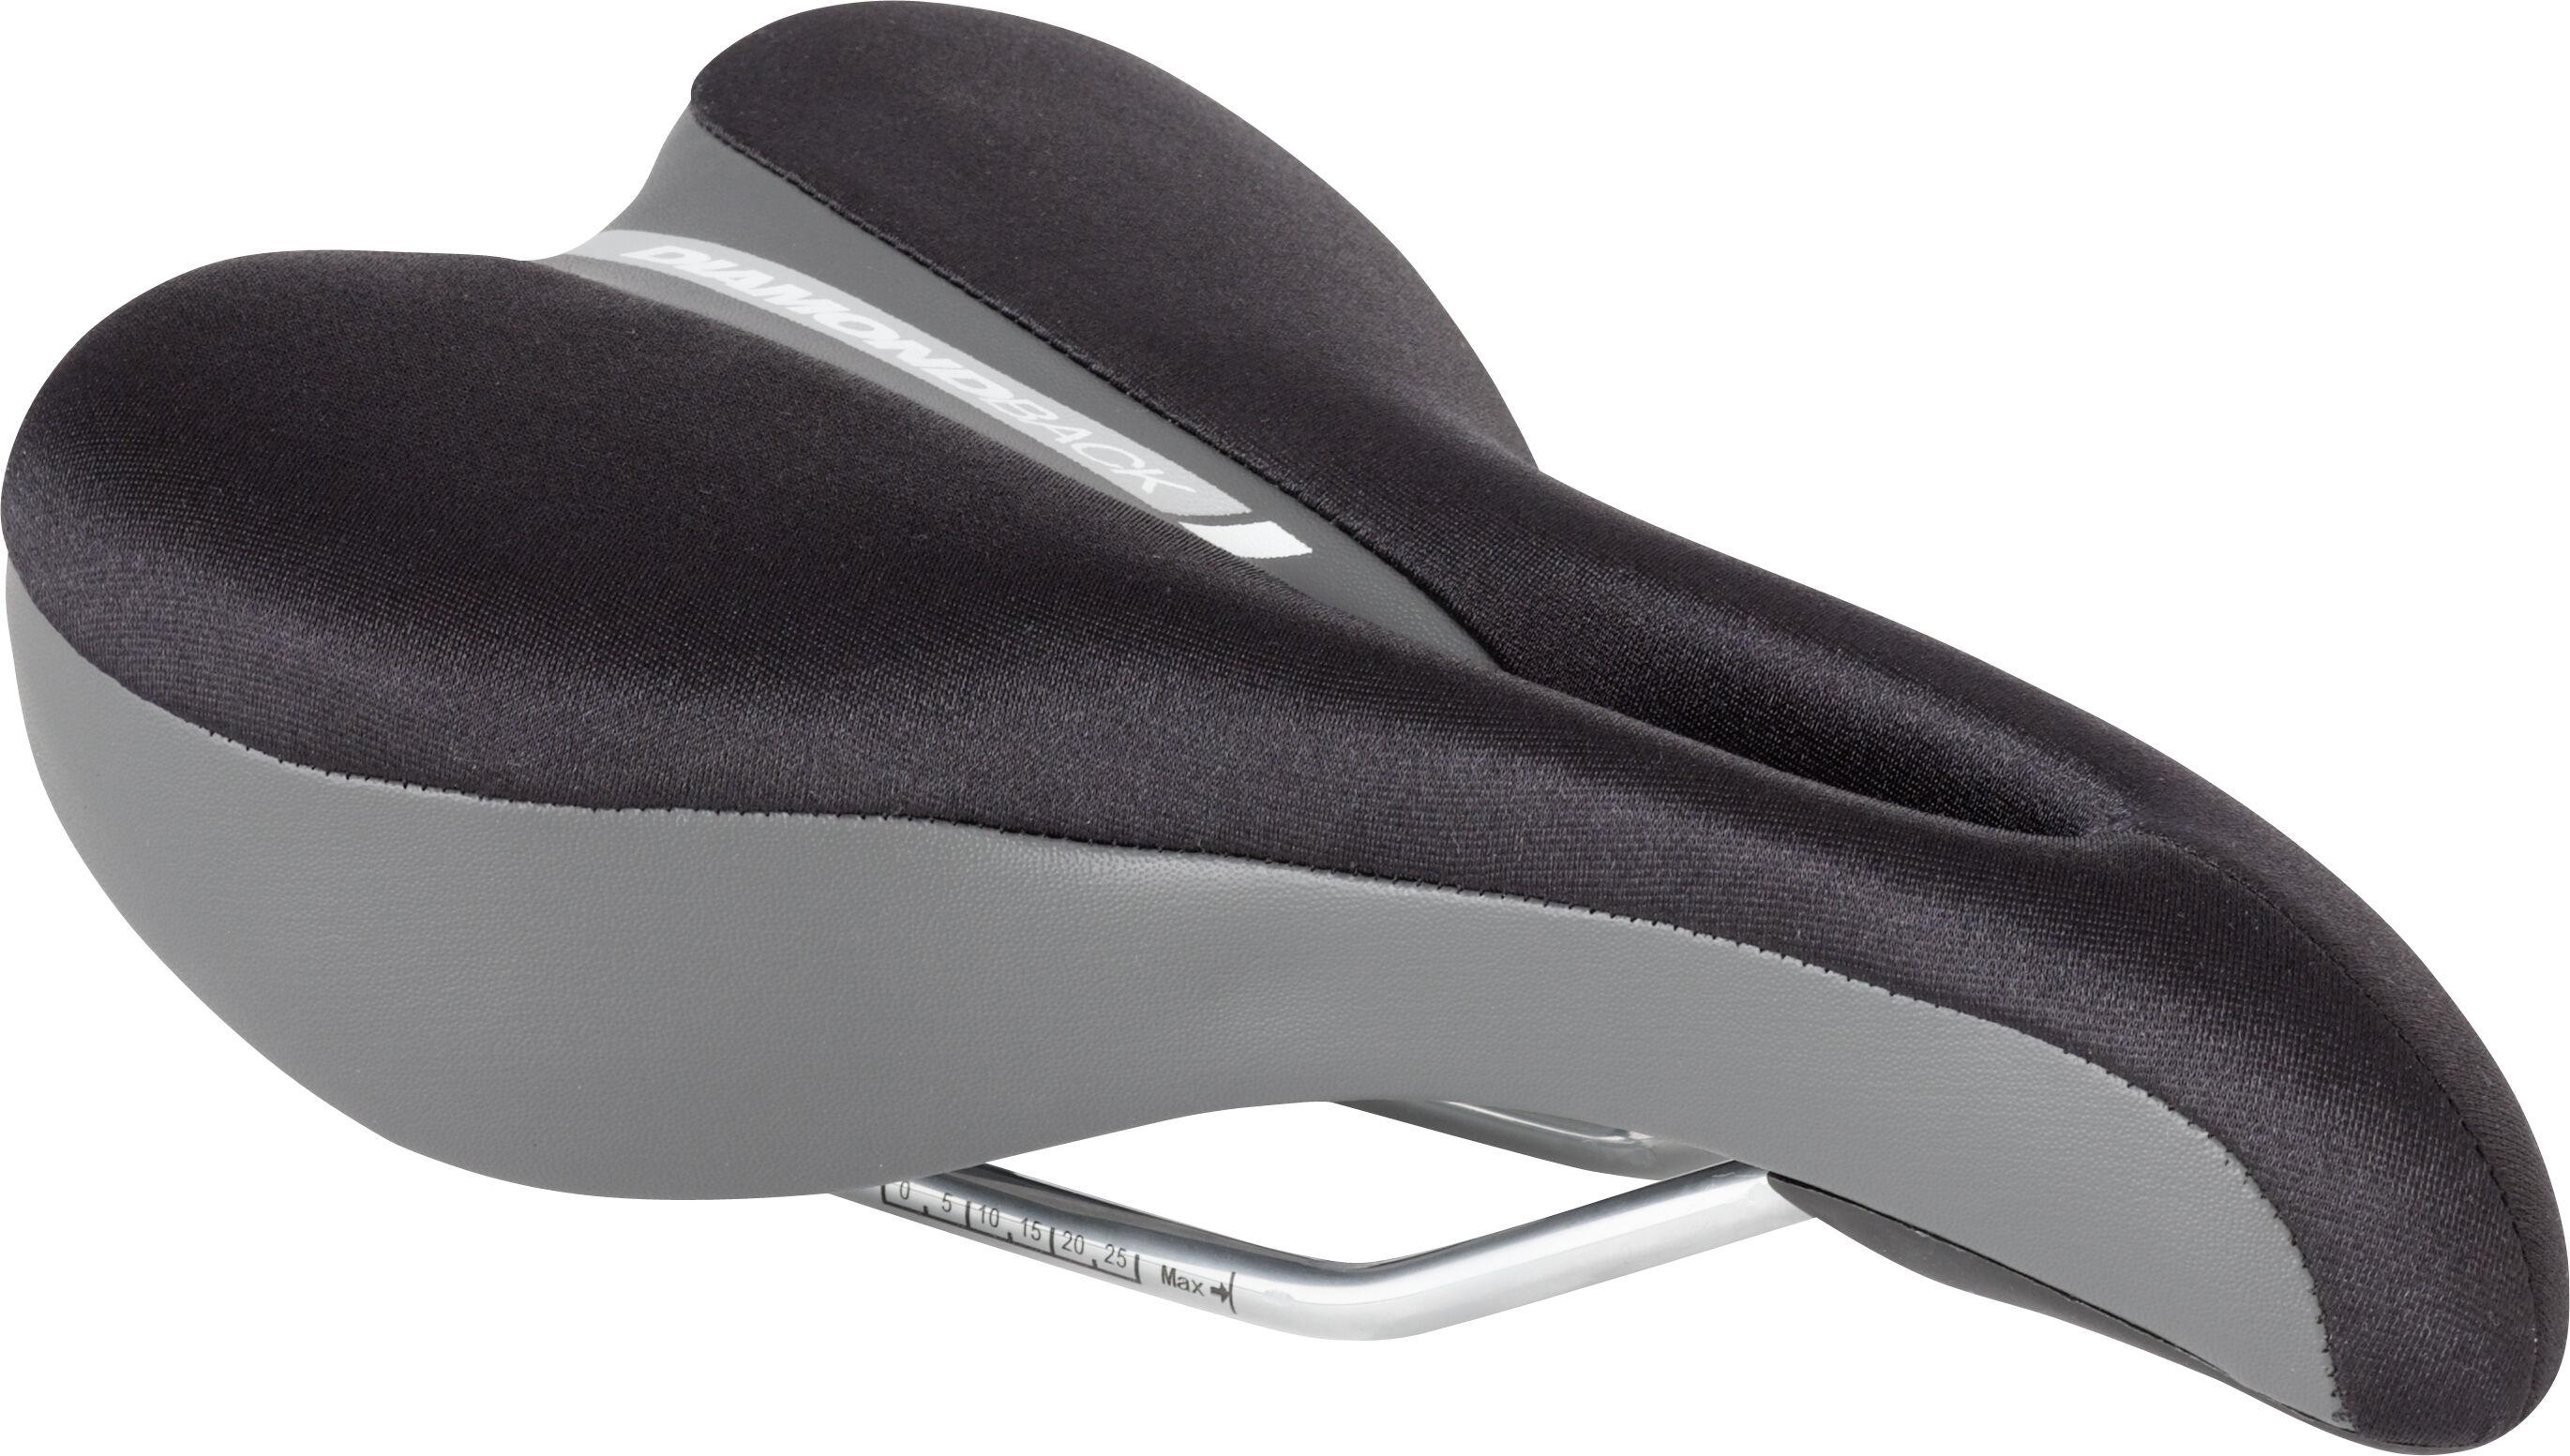 Hybrid Lycra Bike Seat Top - Women's